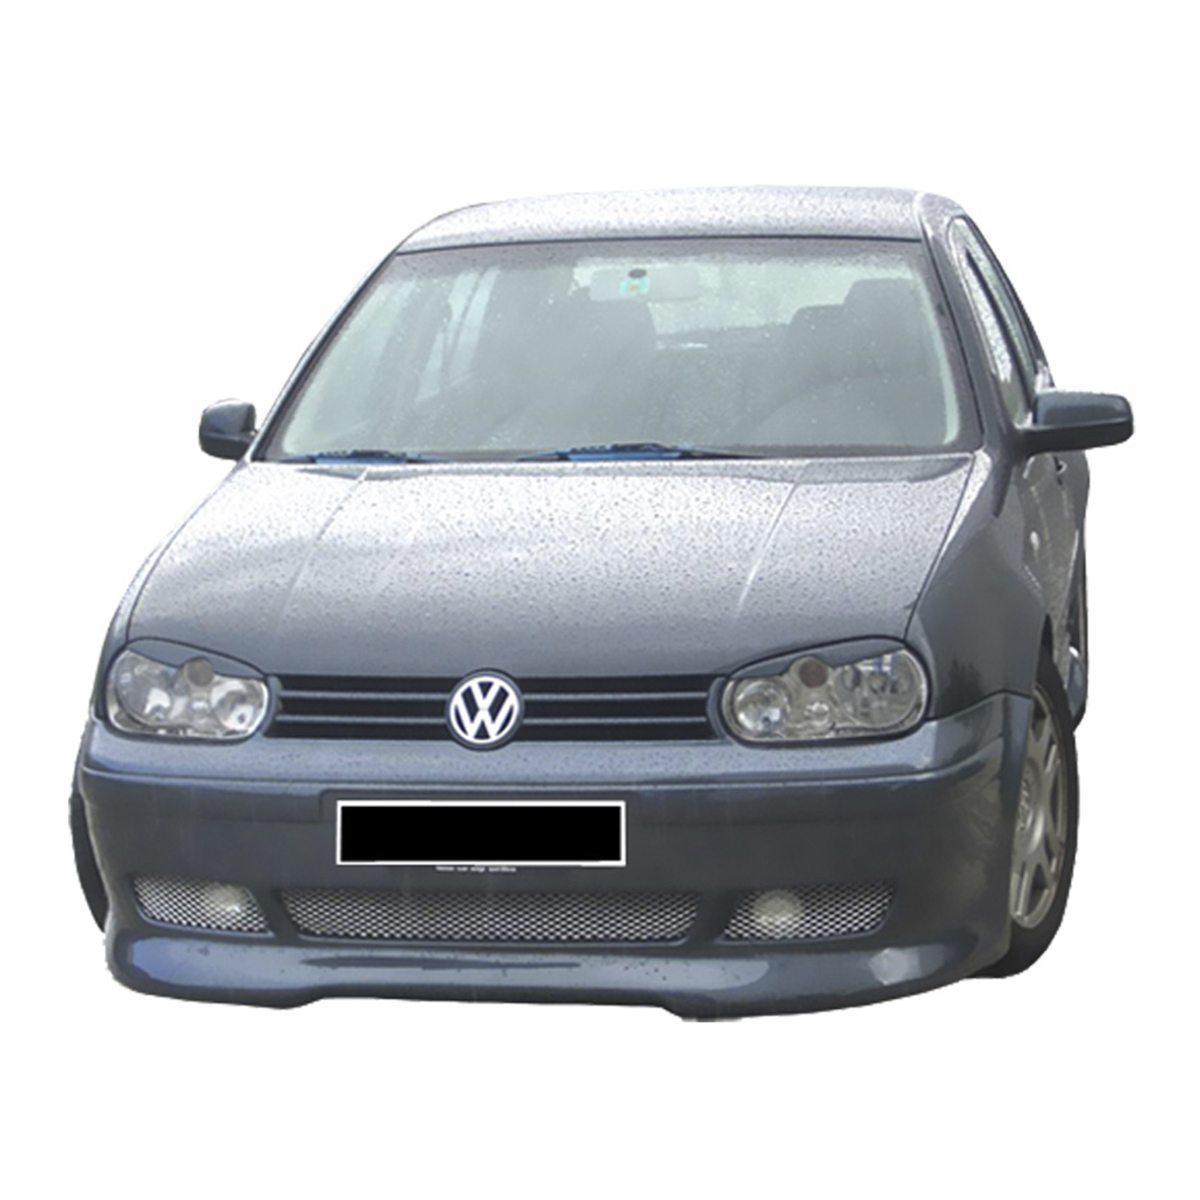 VW-Golf-IV-Earth-Frt-PCU1141